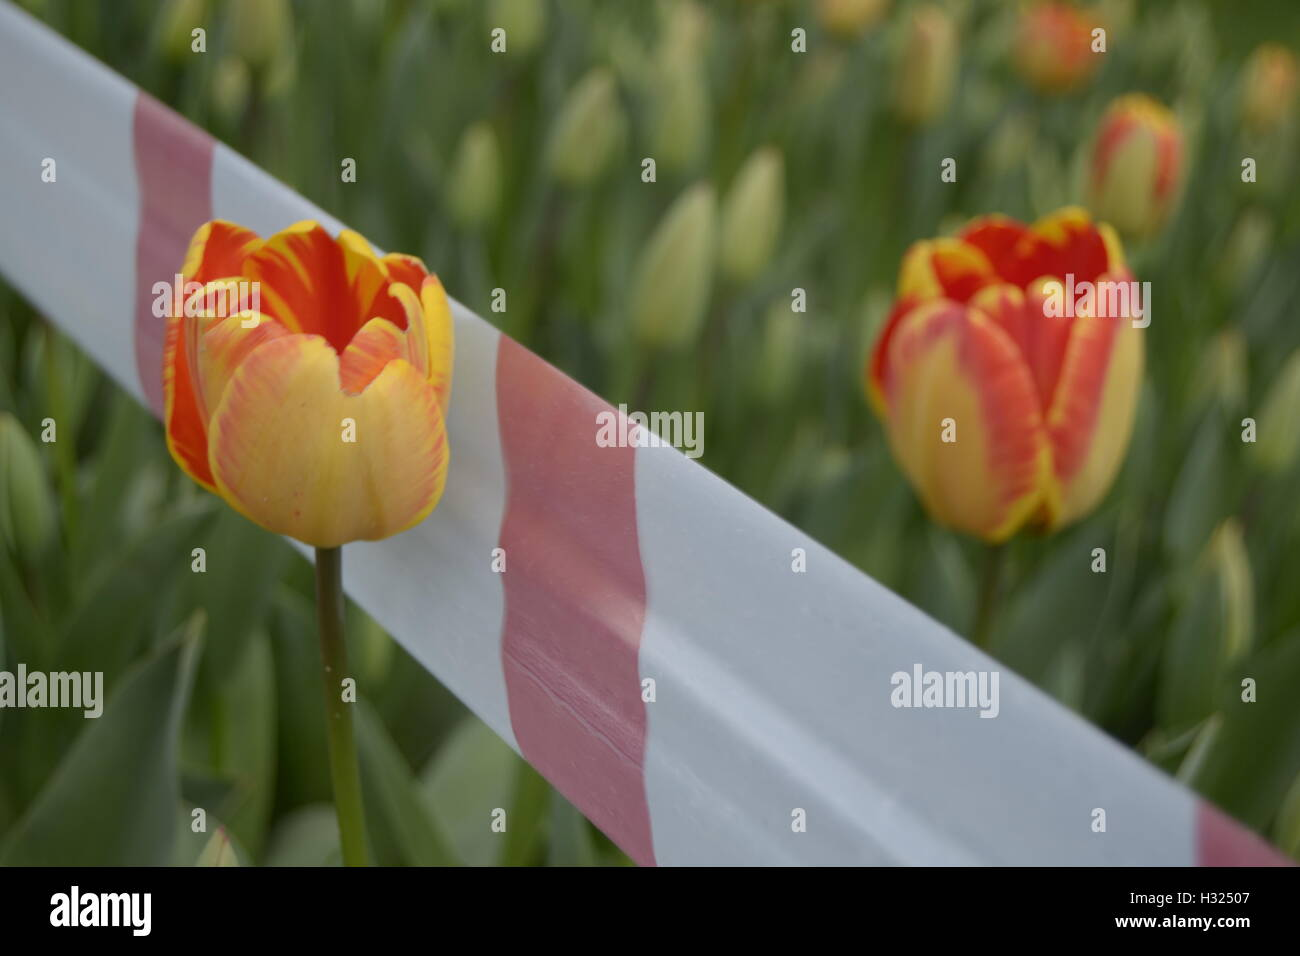 tulip, love, divorce, family, isolate, - Stock Image